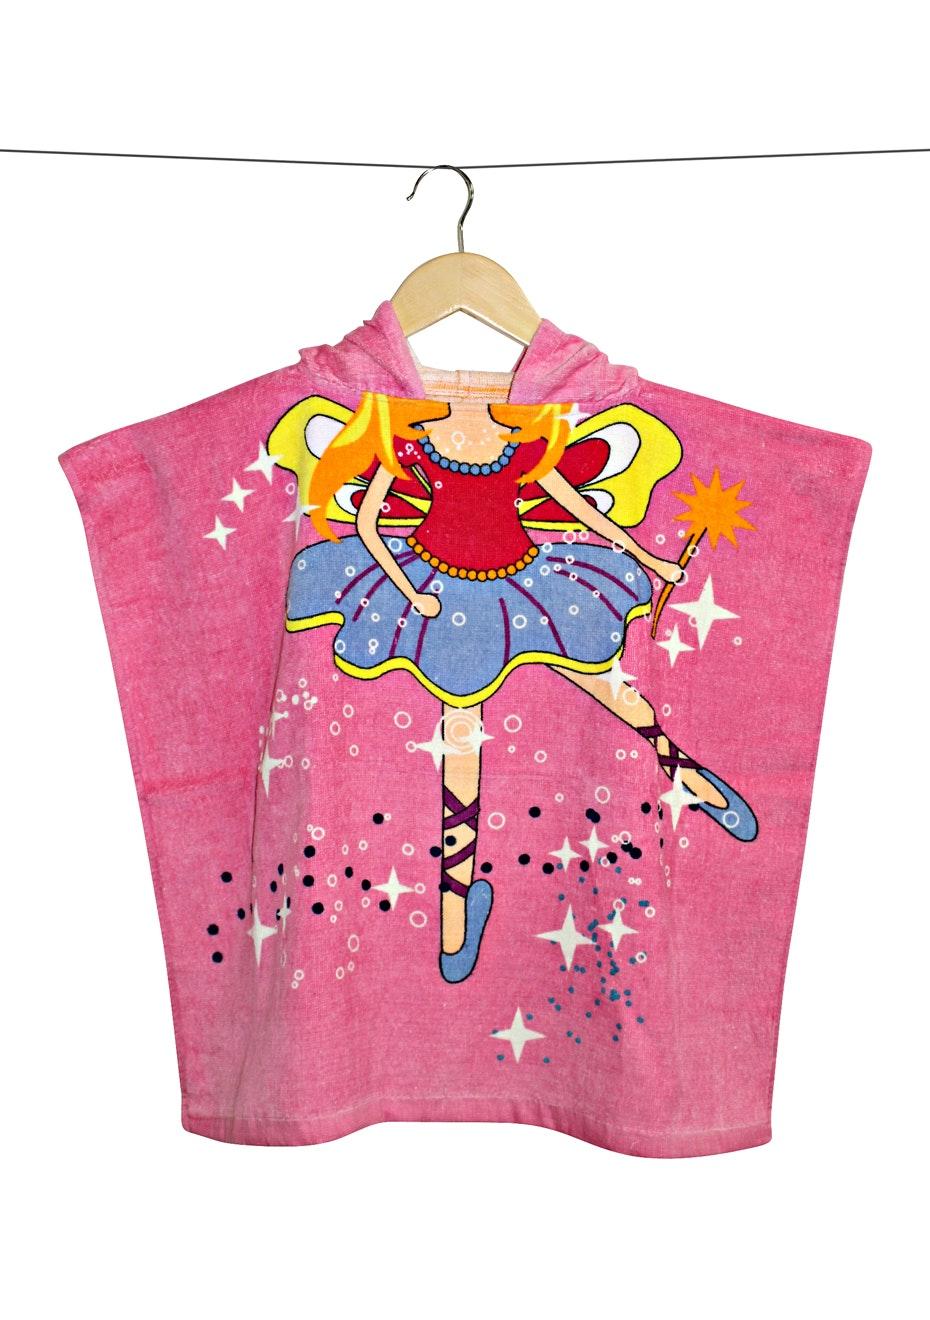 100% Cotton Kids Poncho 60x120cm Neck Size 5.5cm - Ballerina